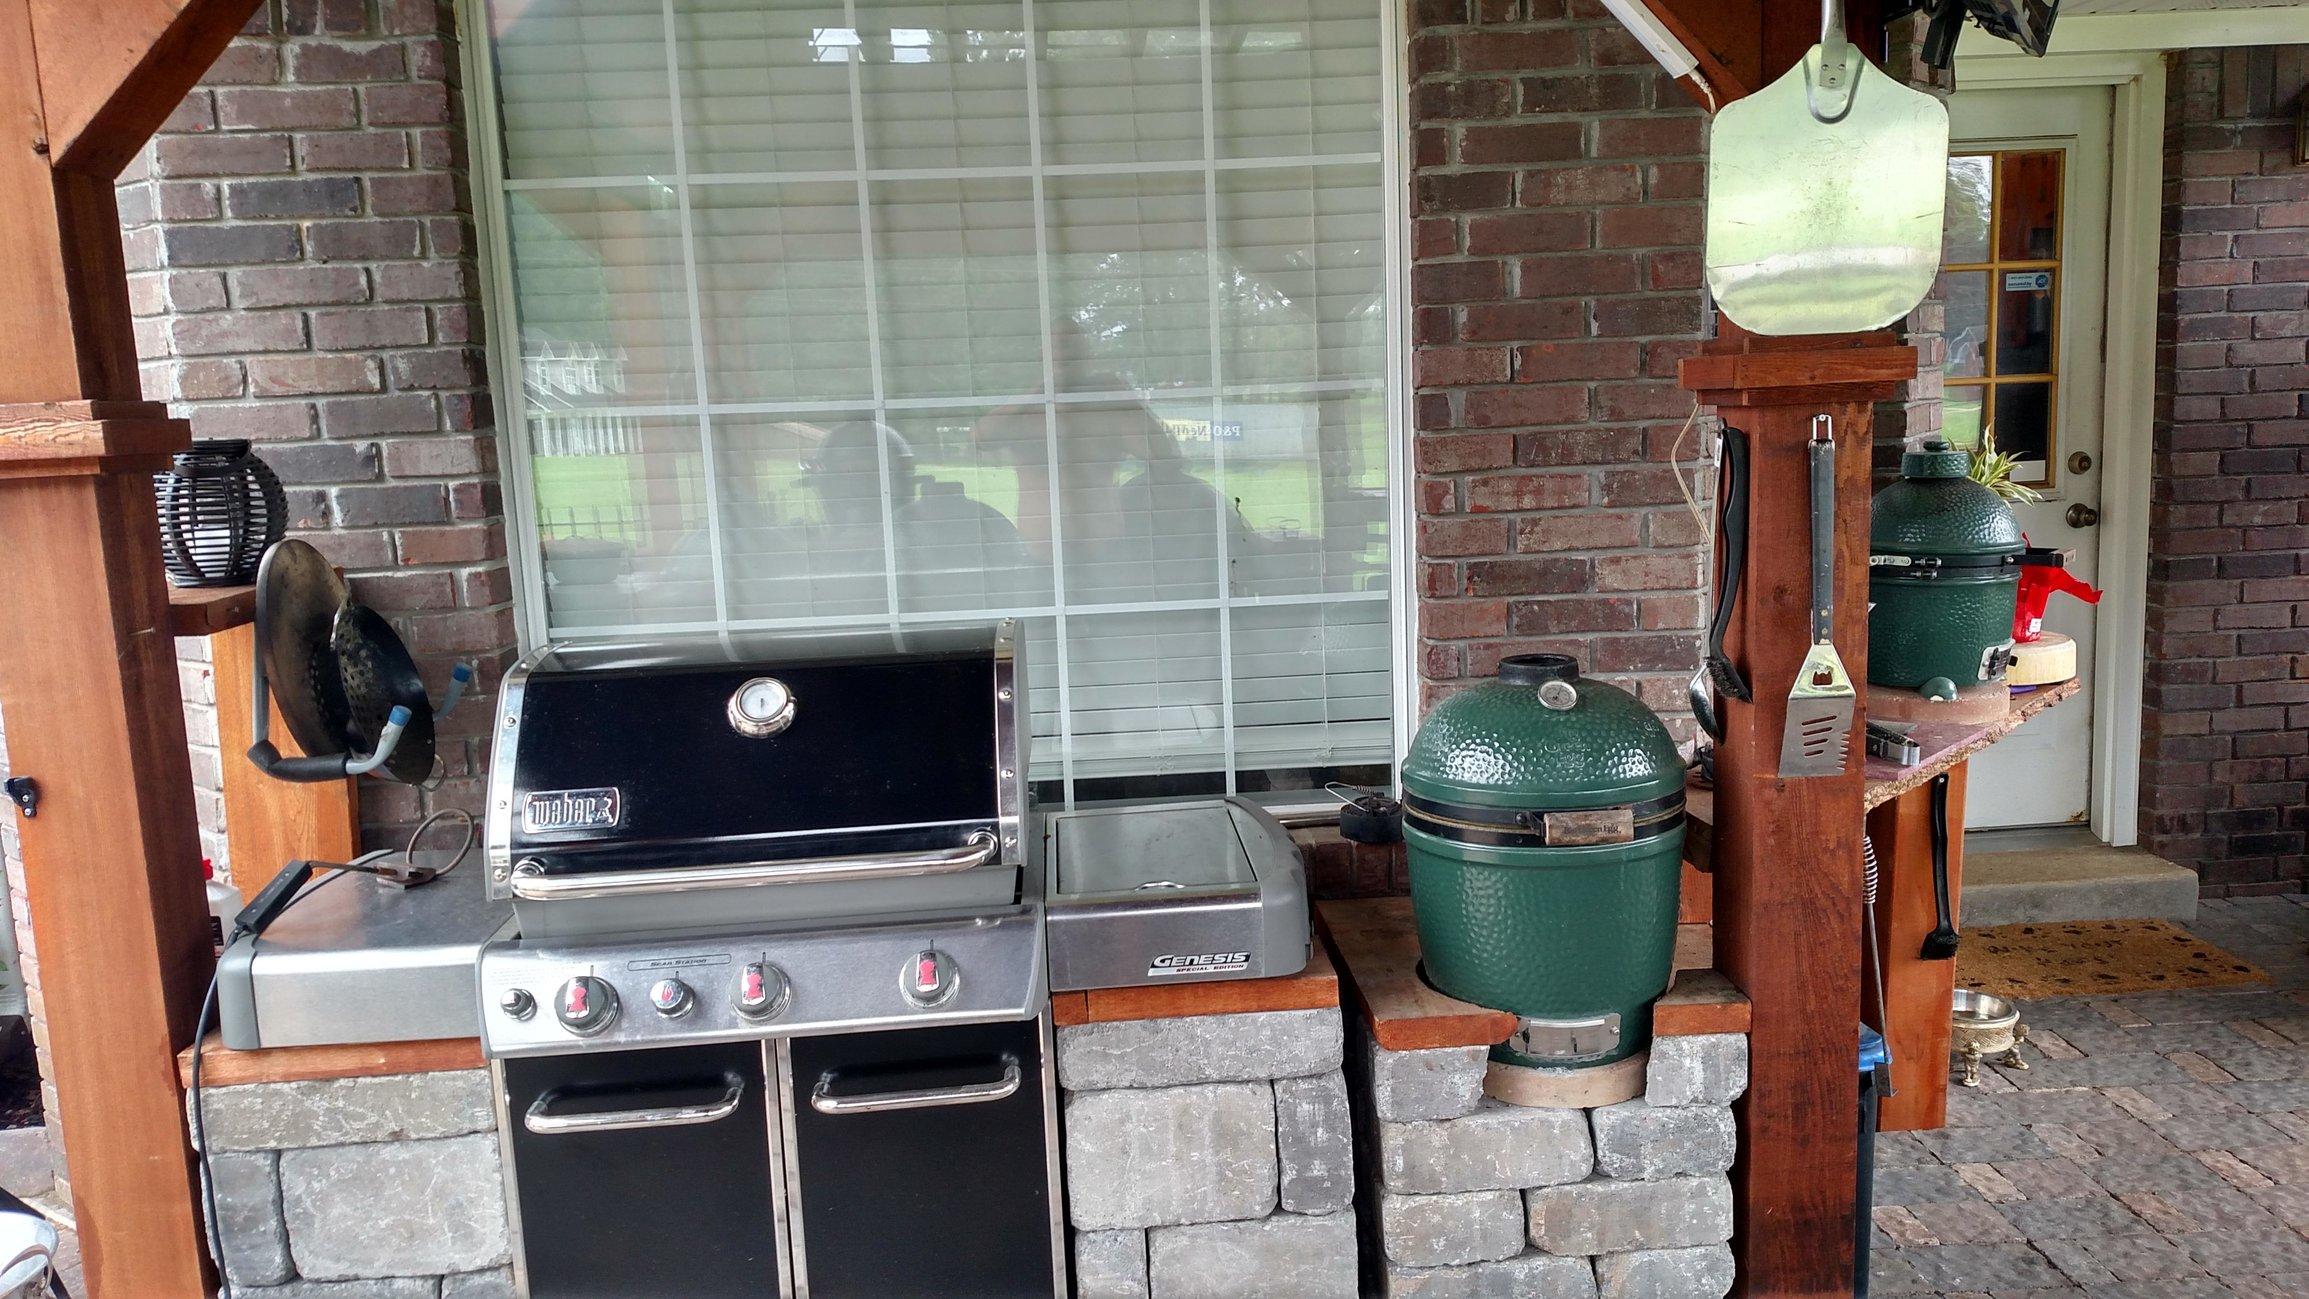 Outdoor Kitchen Weber Genesis Help Big Green Egg Egghead Forum The Ultimate Cooking